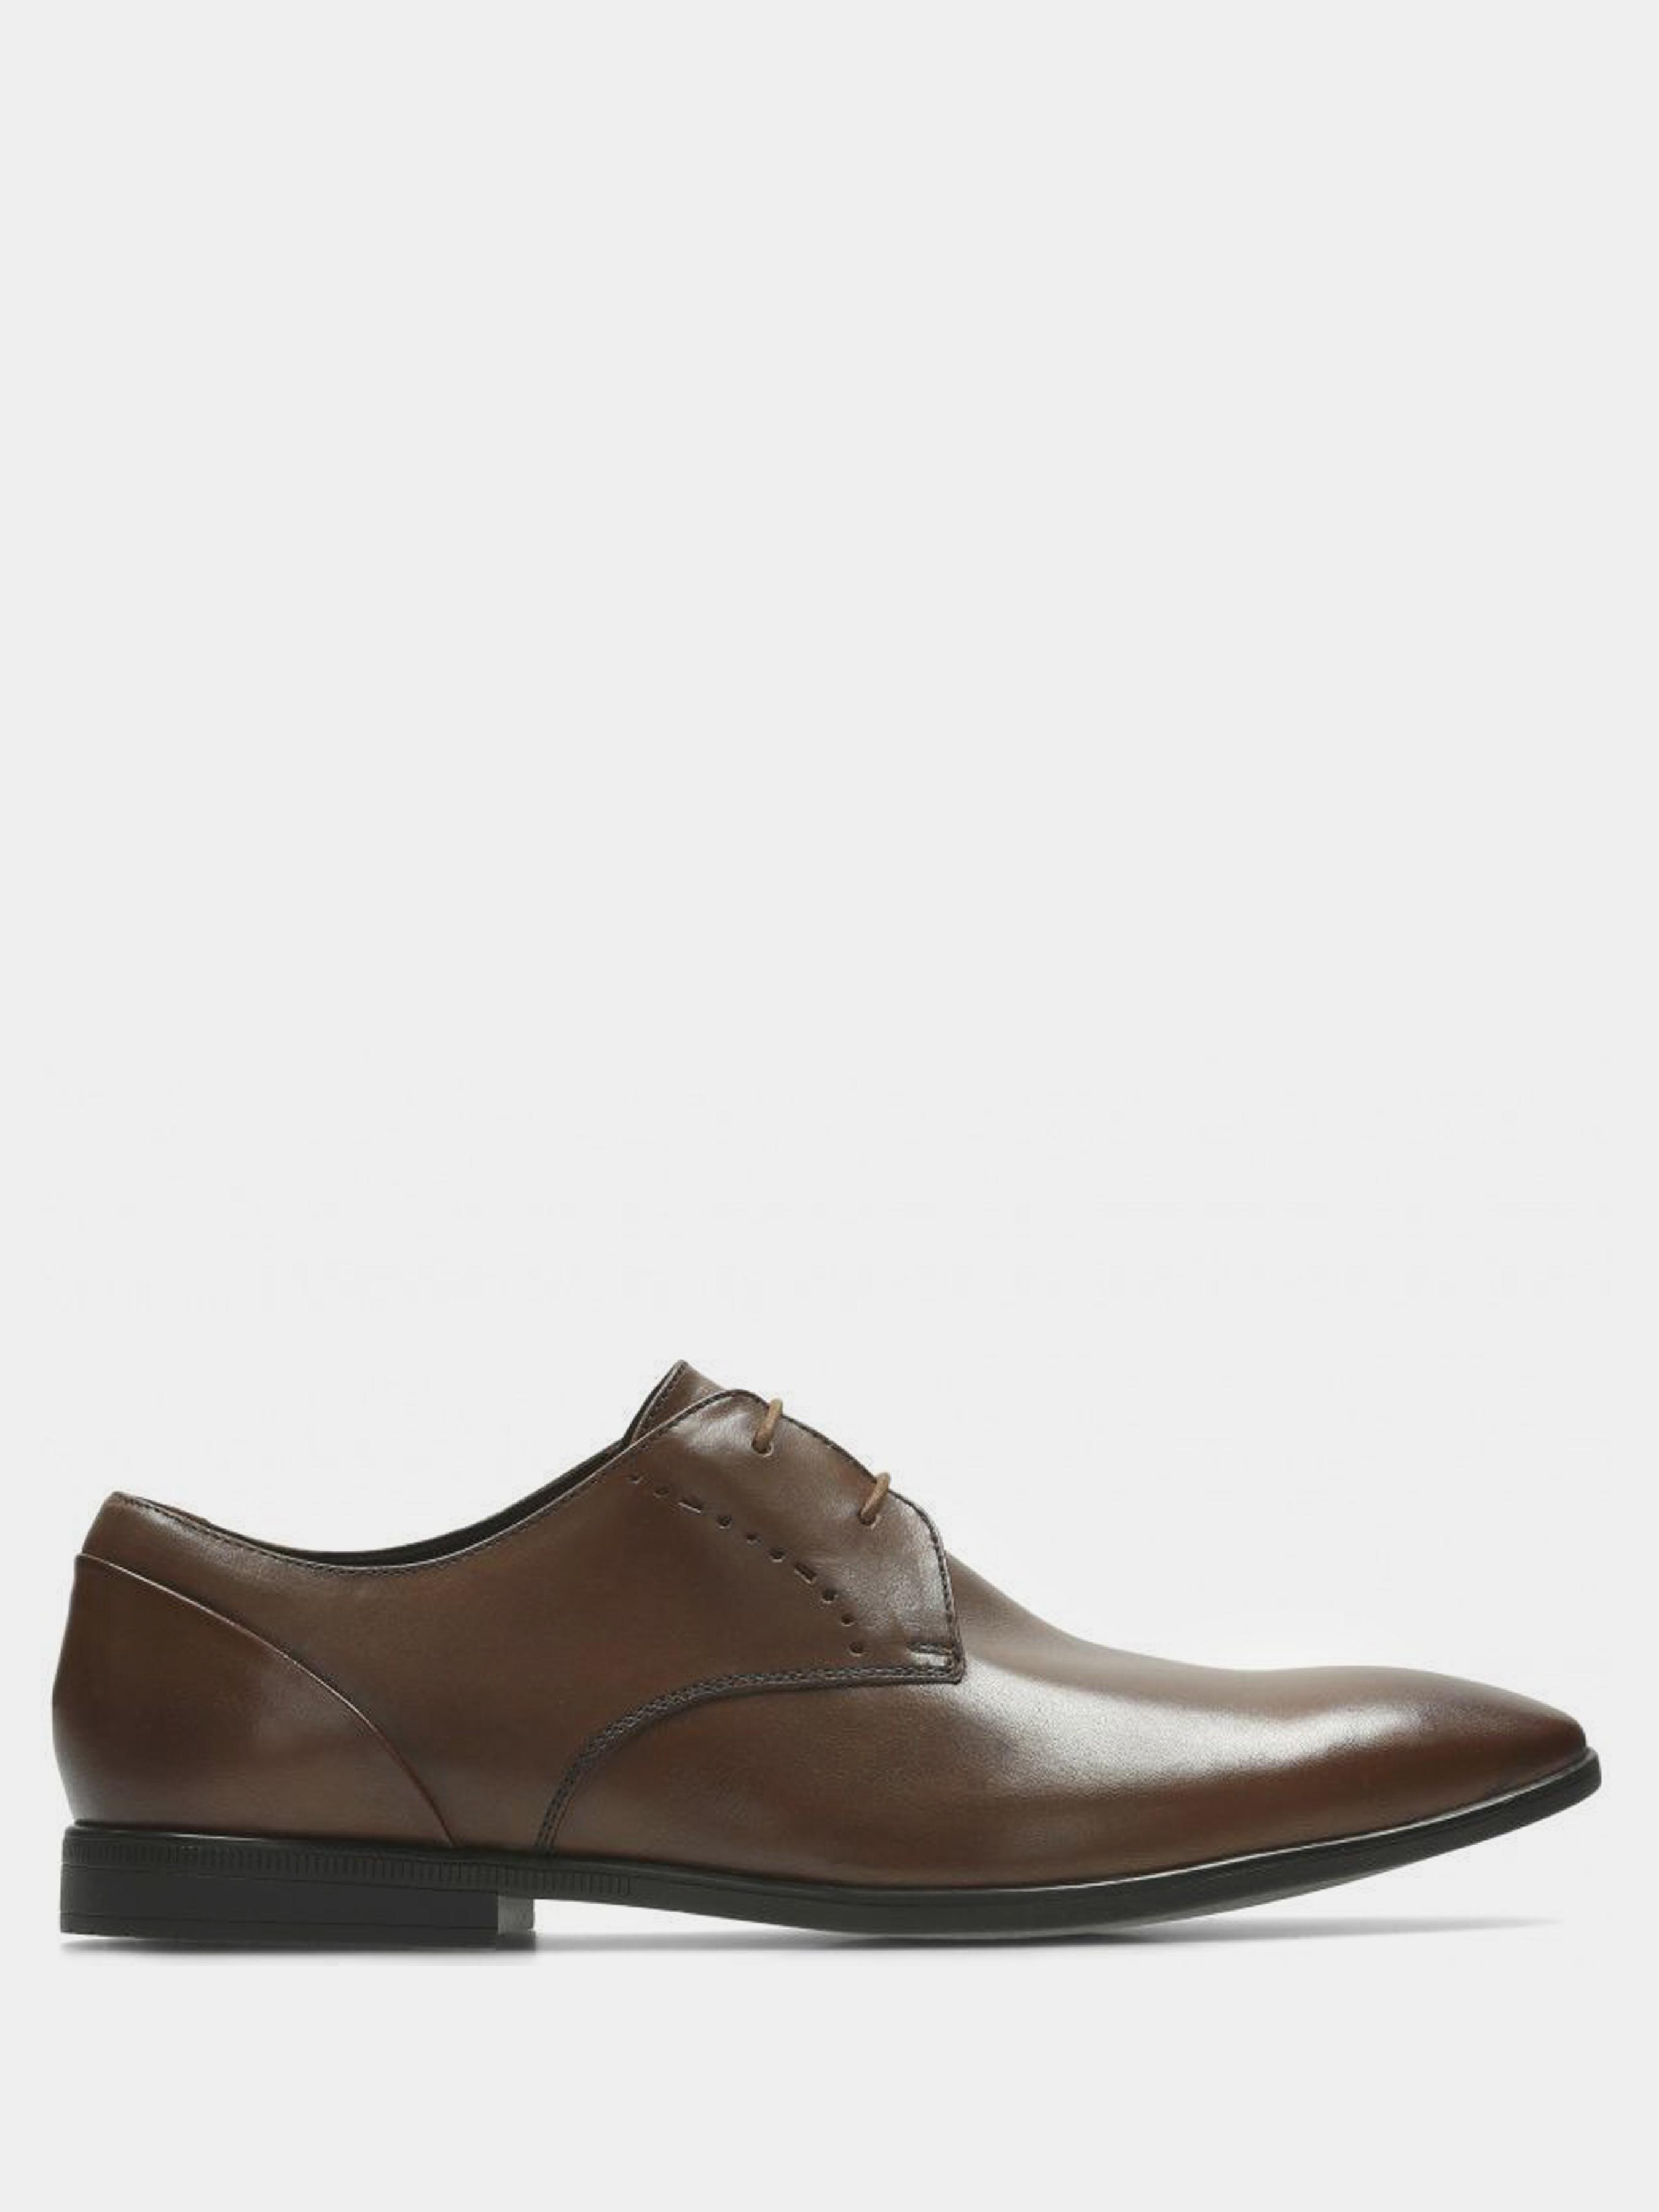 Туфли для мужчин Clarks Bampton Lace OM2819 купить обувь, 2017